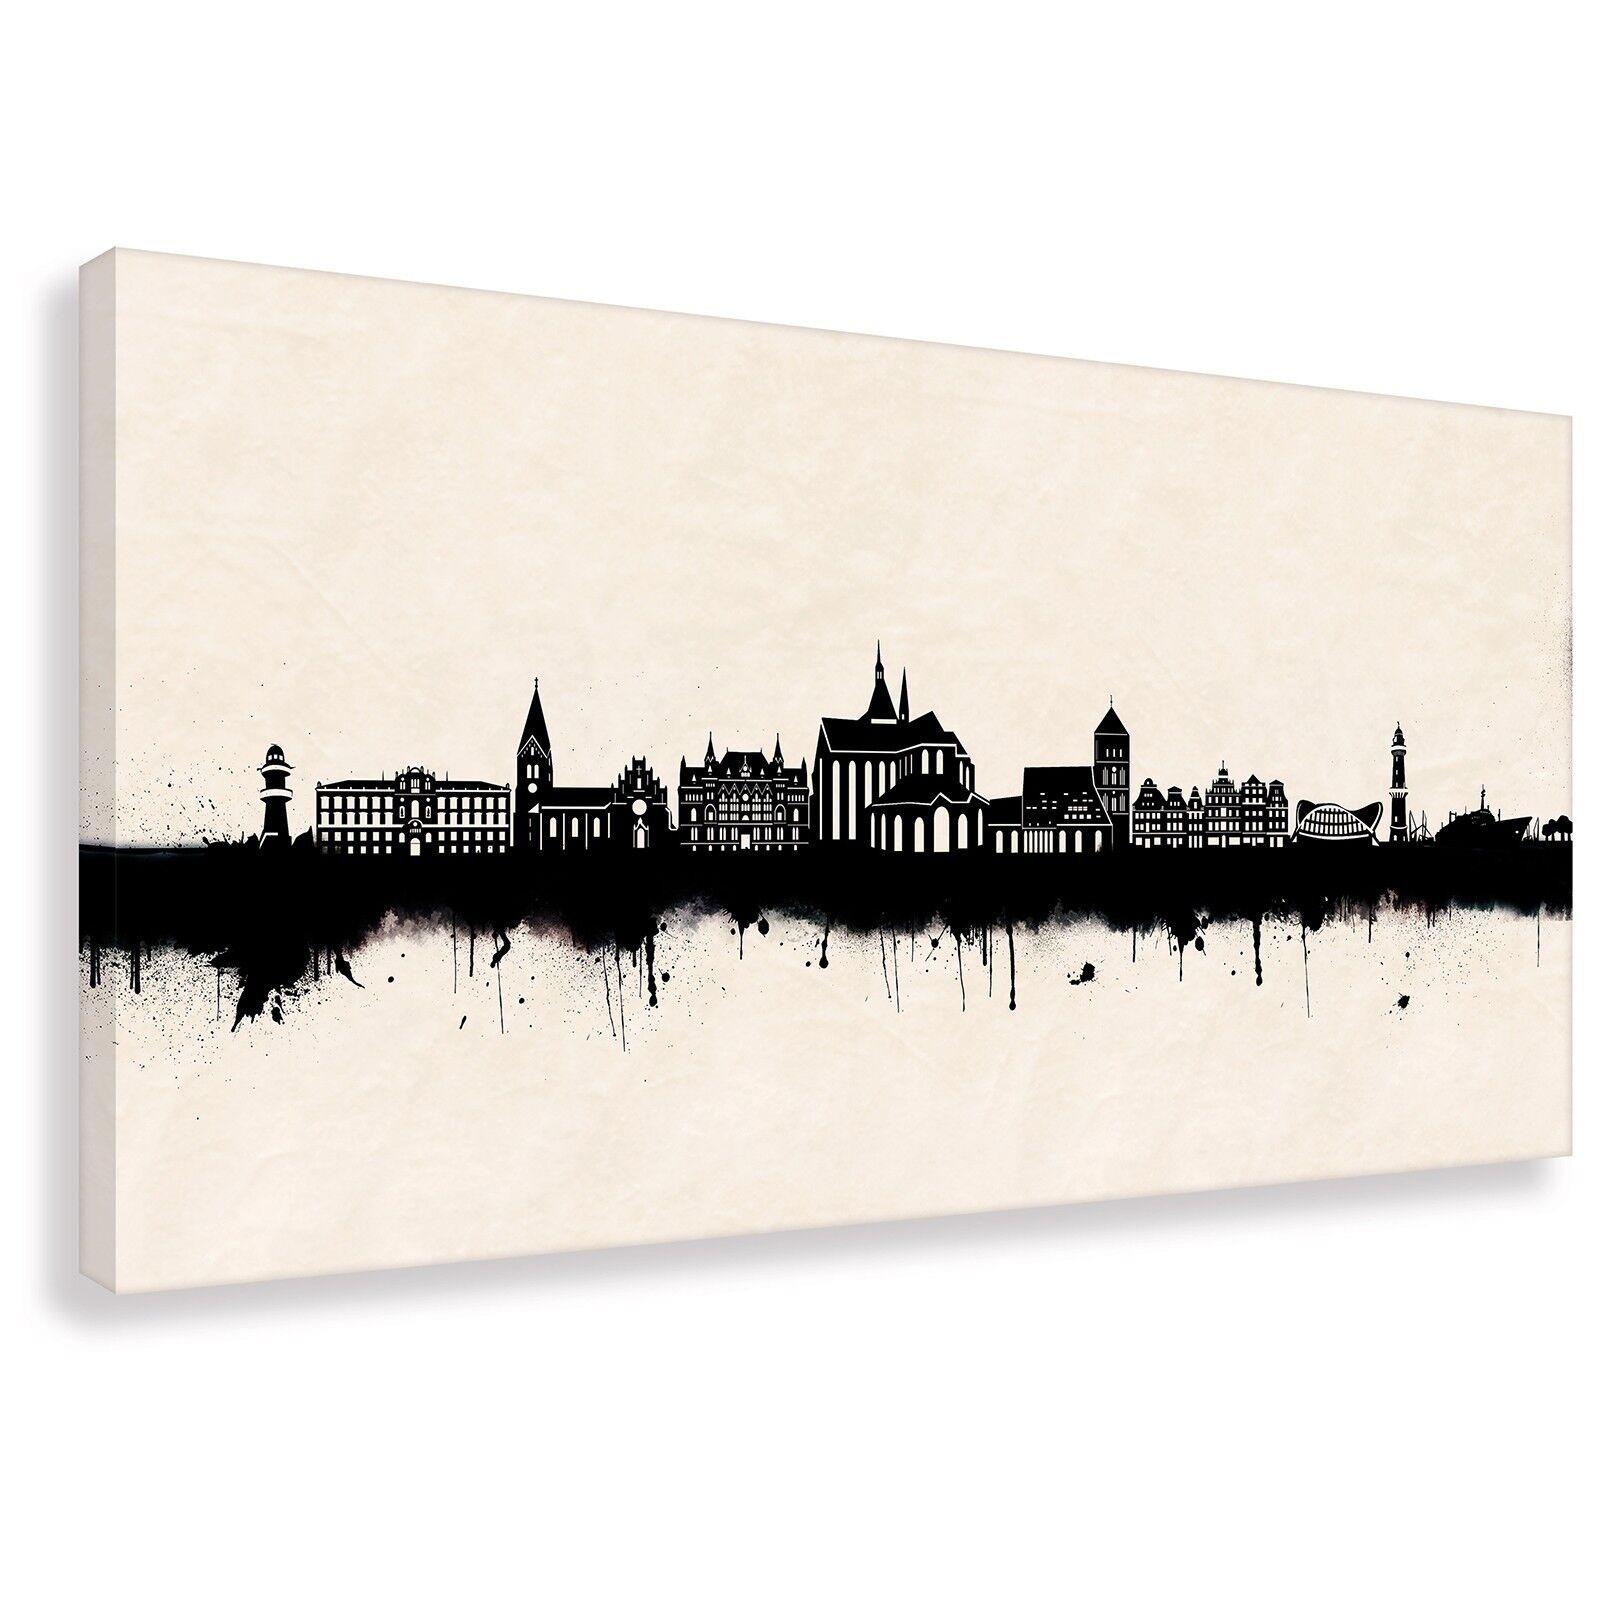 Kunstdruck auf Leinwand - Street Art - Skyline Rostock SW (div. Größen) Wandbild